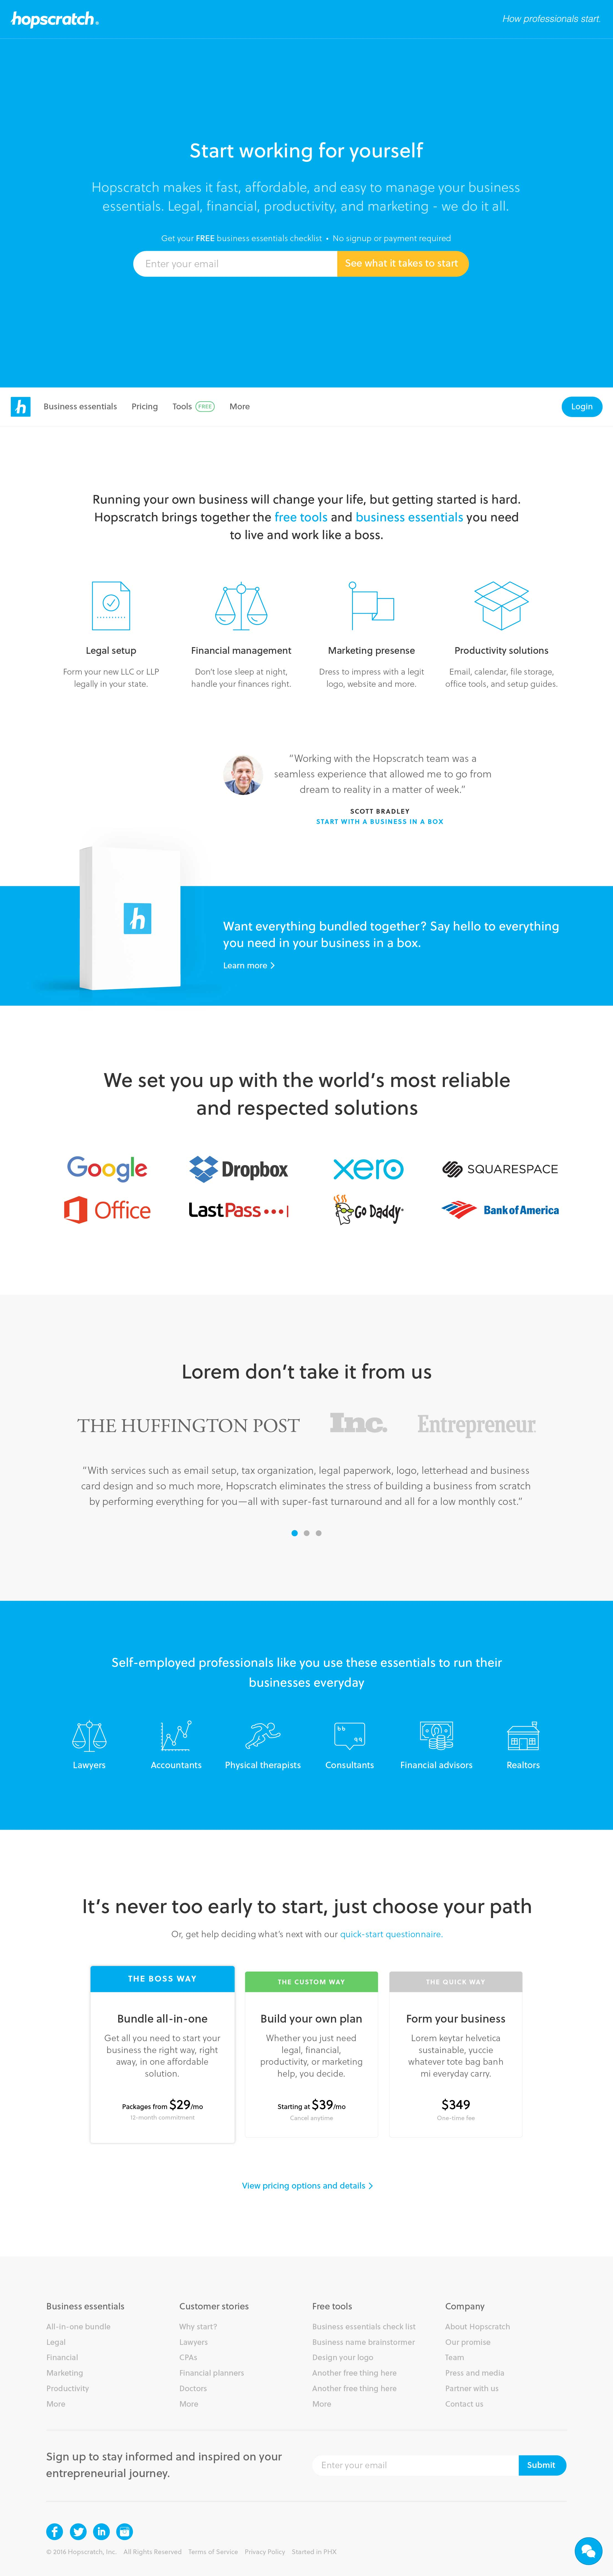 Hopscratch-Marketing-Home.jpg